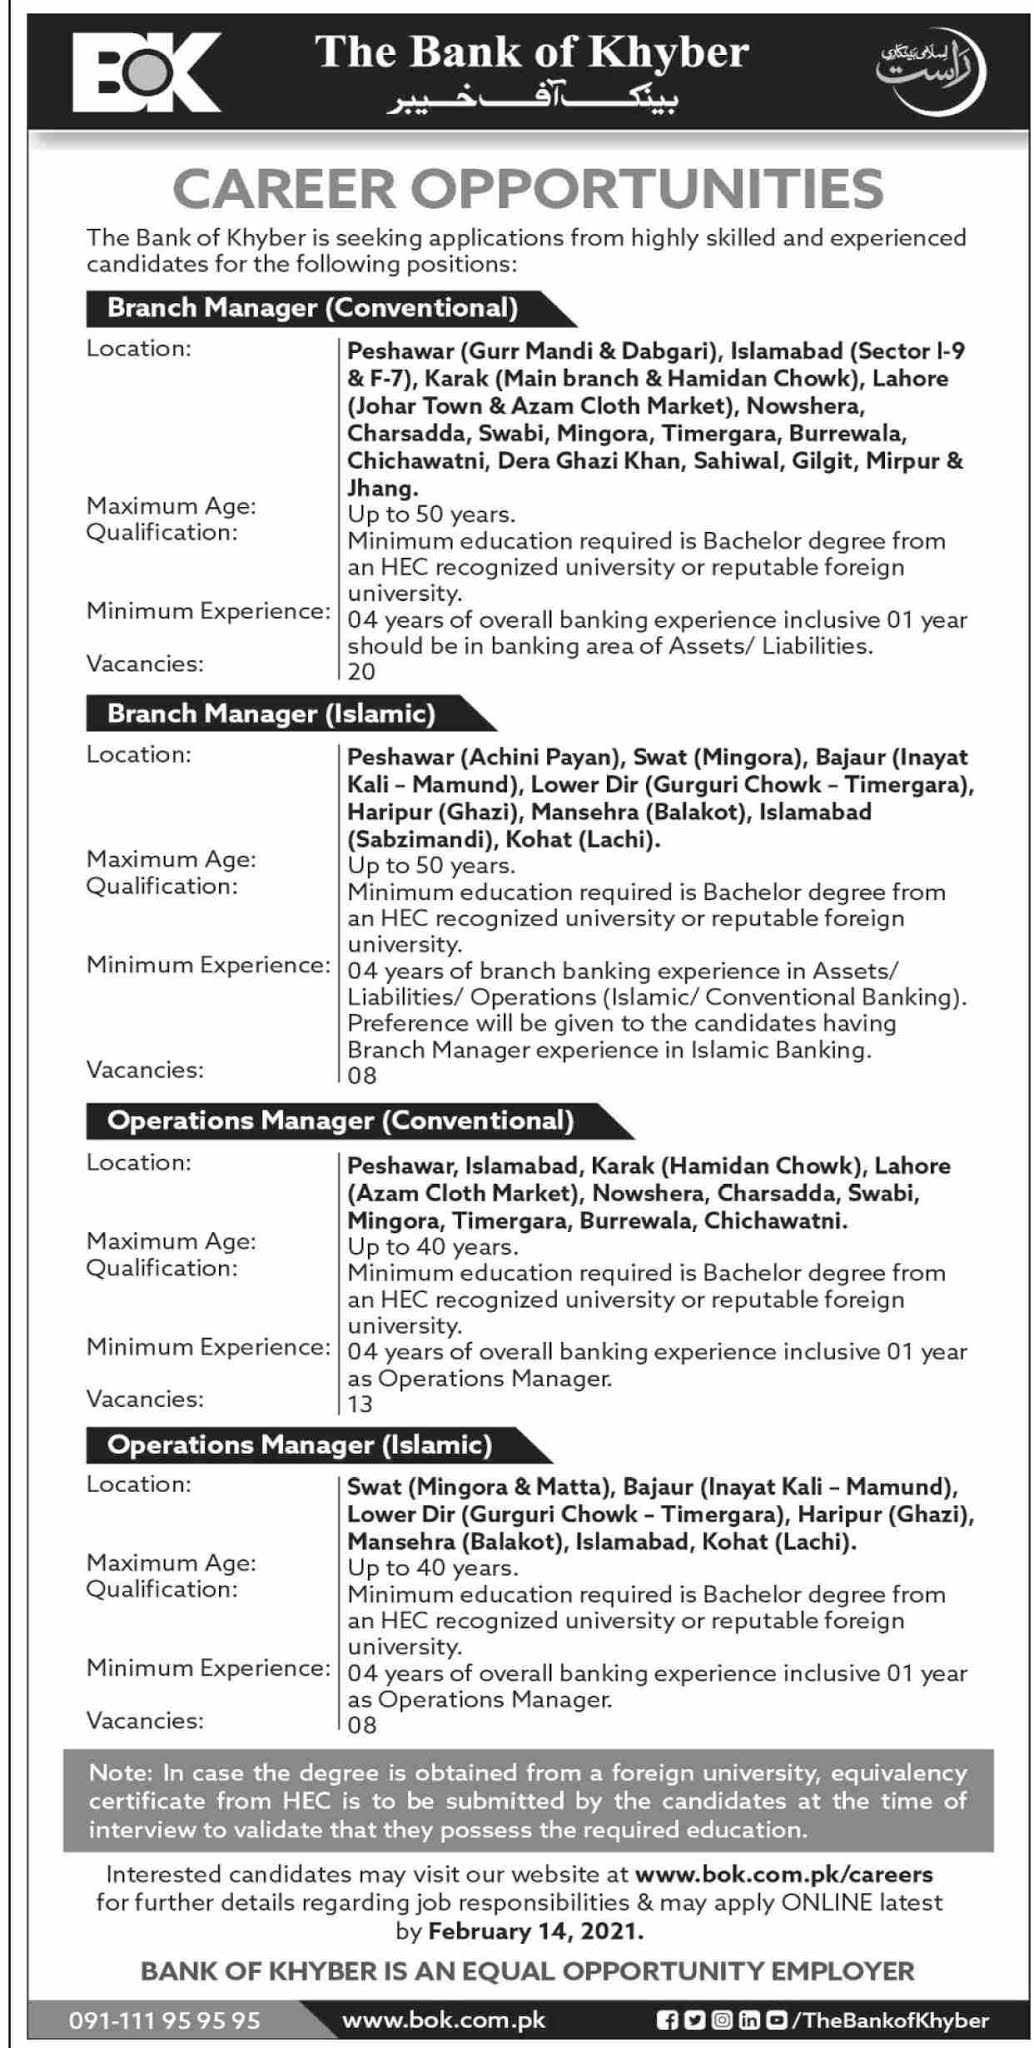 Online Apply - www.bok.com.pk/careers - BOK Jobs Advertisement - Bank of Khyber Jobs Career - BOK Jobs - BOK Careers - Bank of Khyber Jobs 2021 -